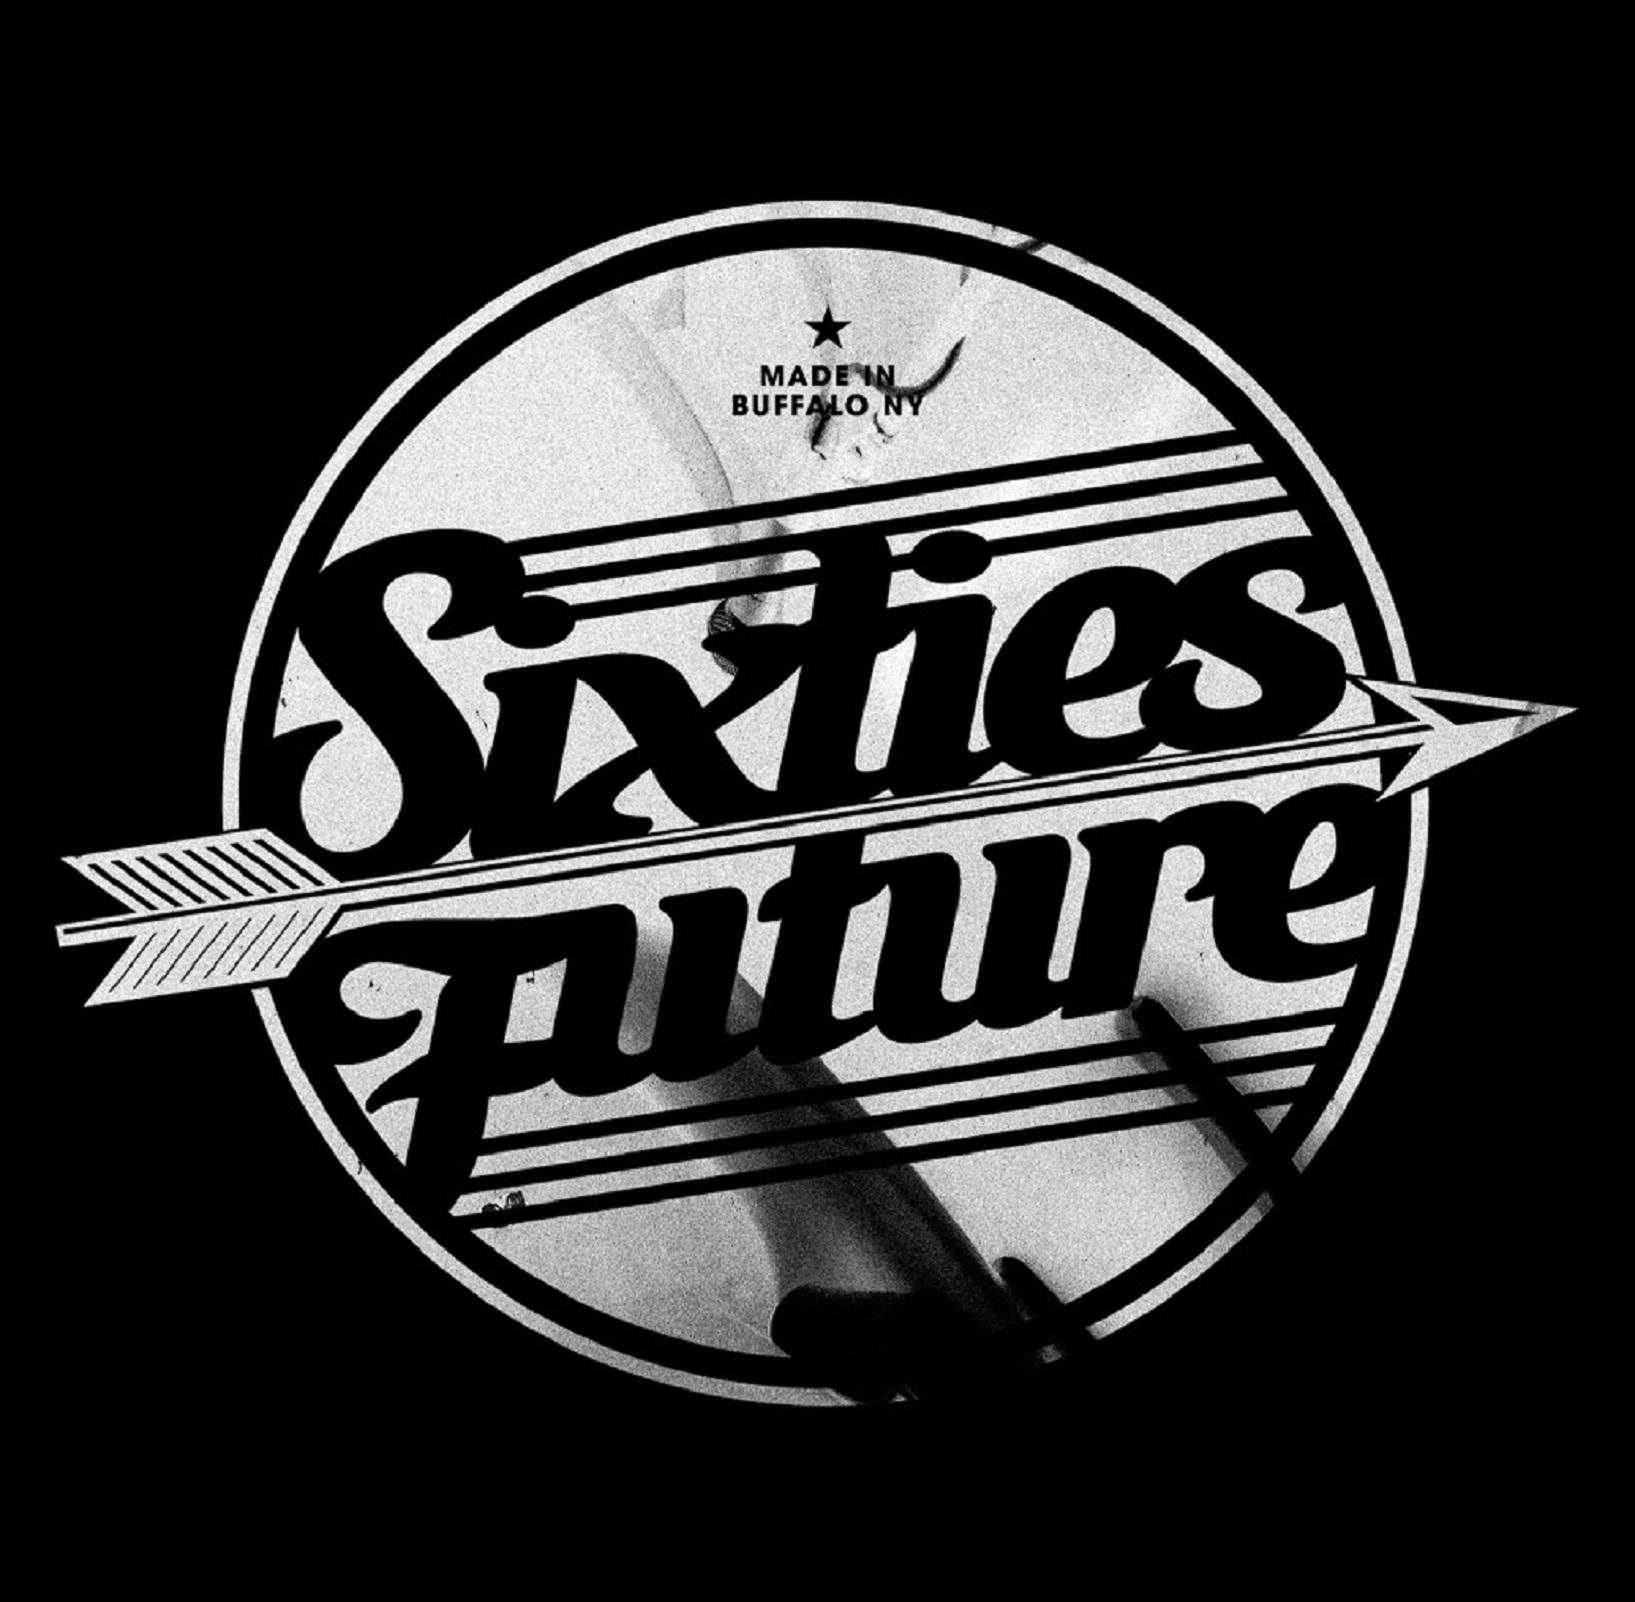 sixtiesfuturecoverart (1)